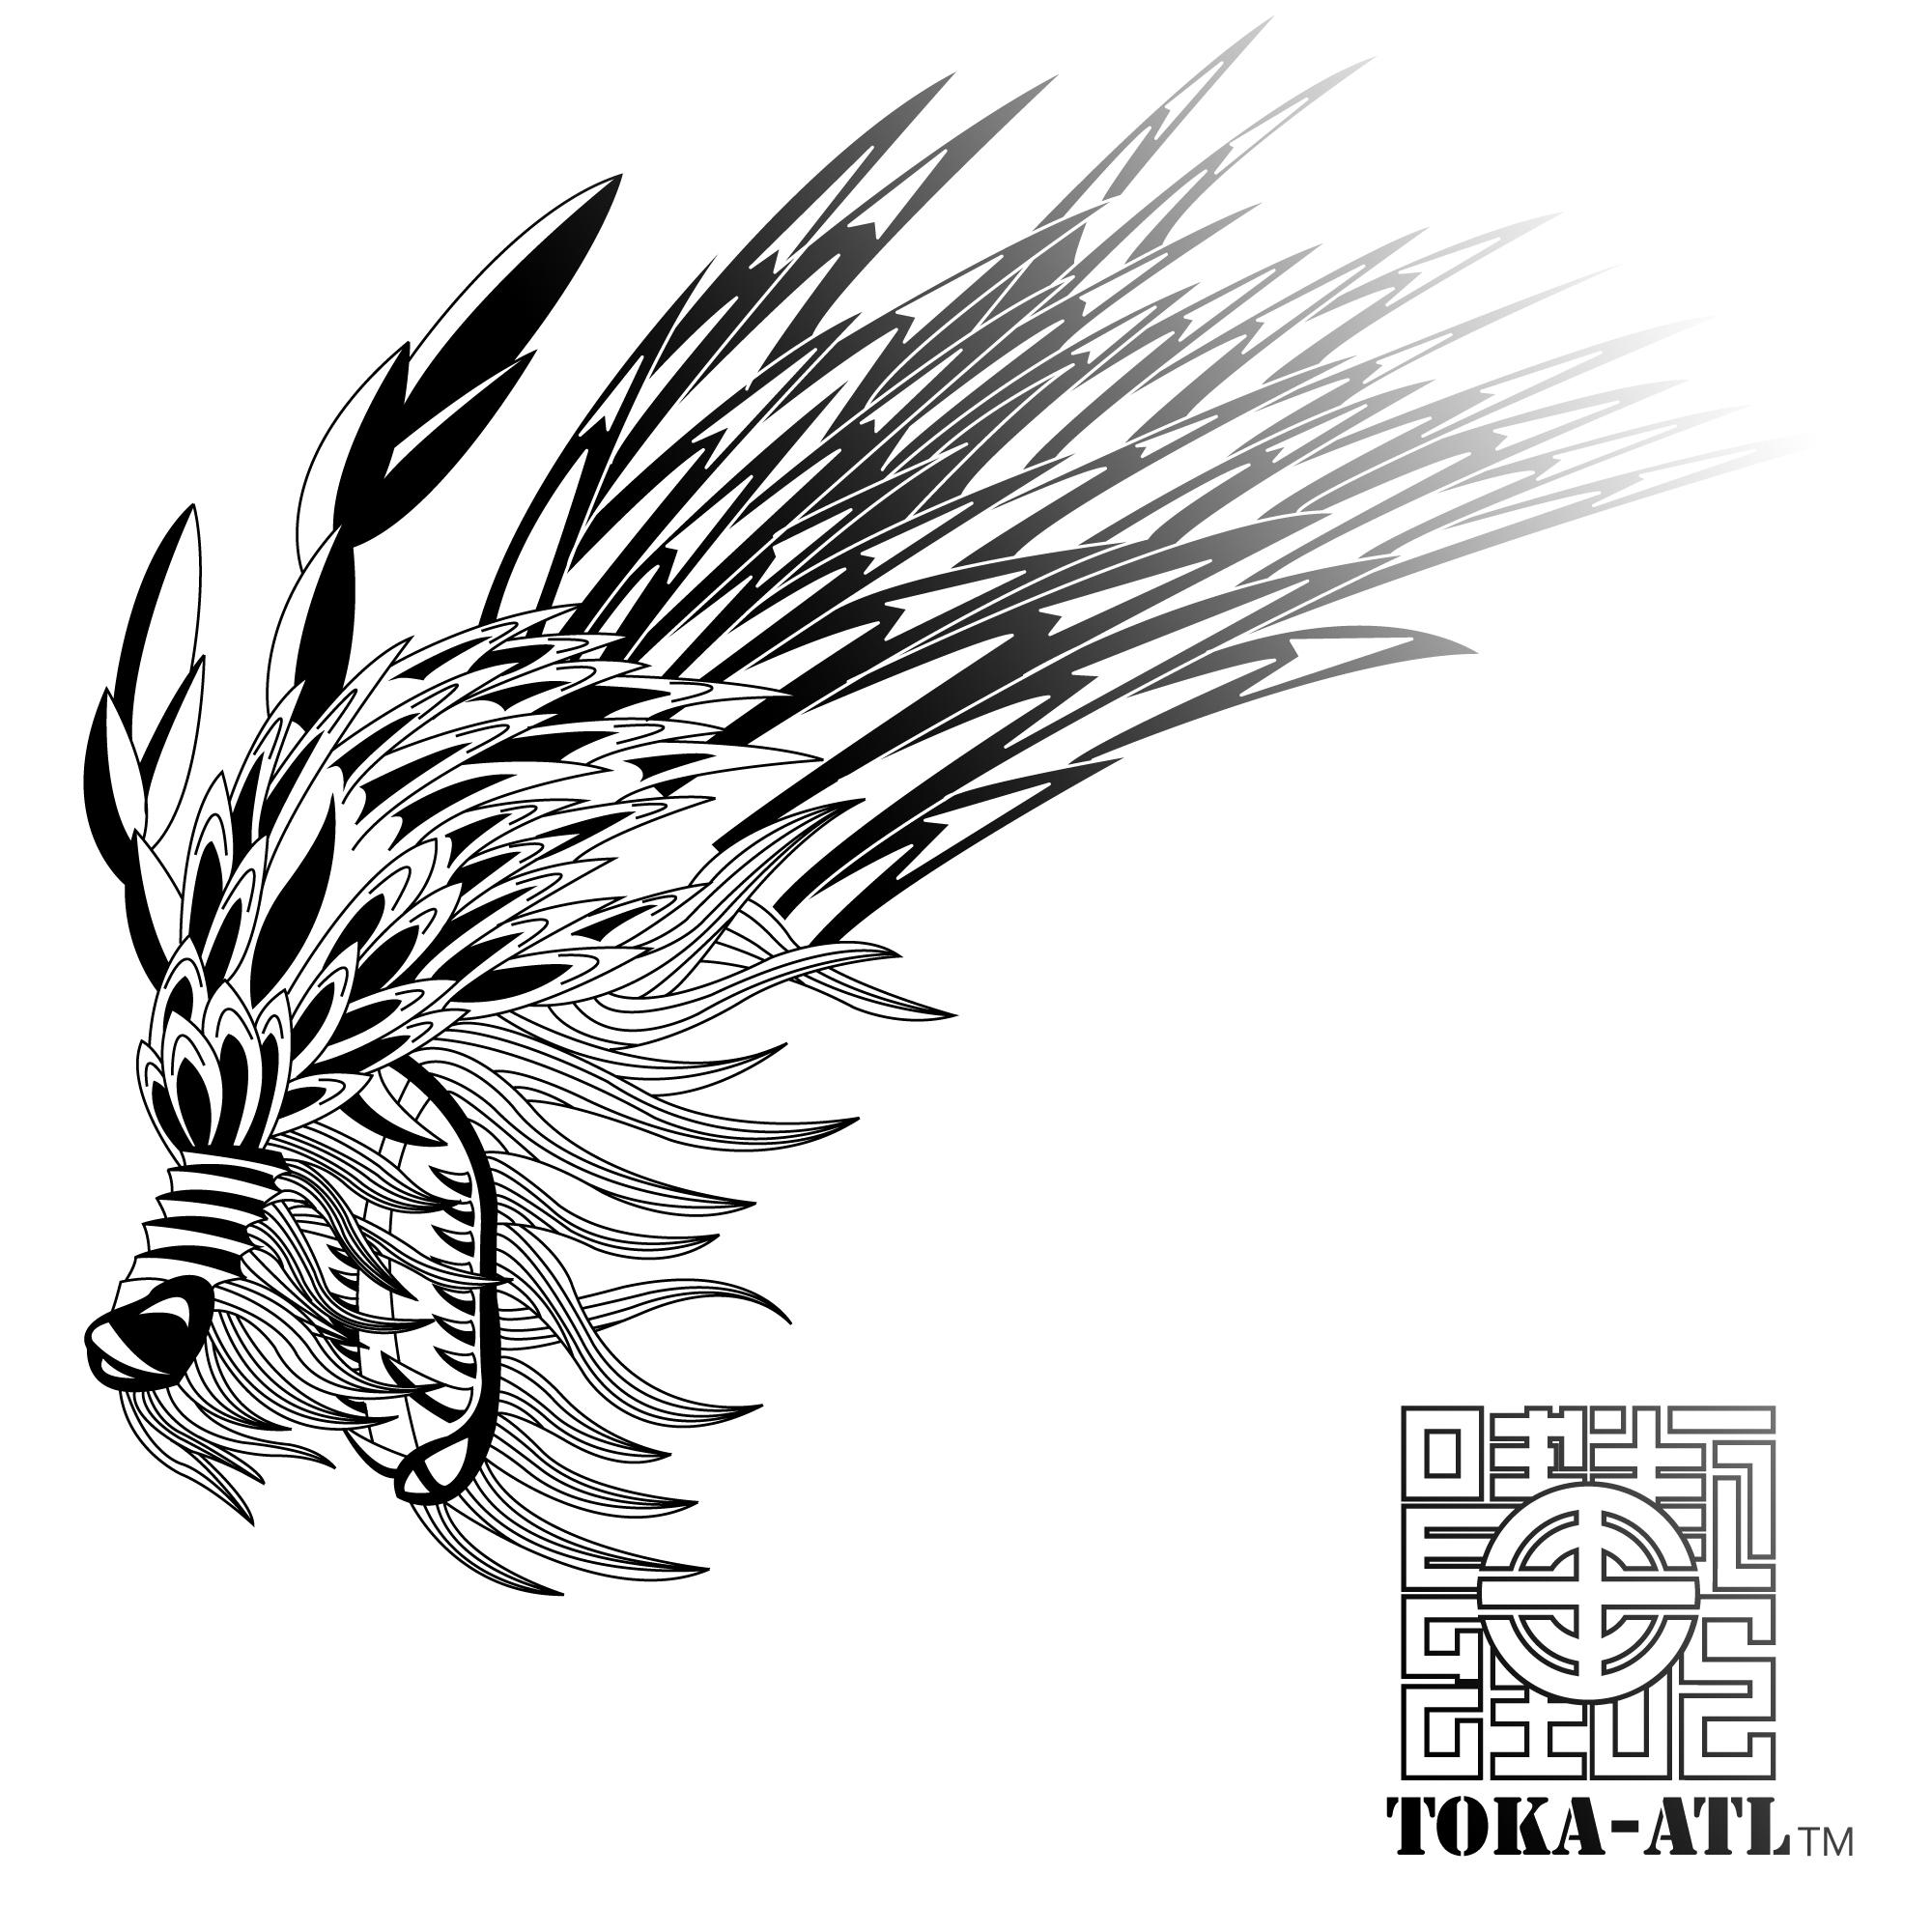 2000x2000 Oriental Dragon Designed By Toka Atl Tribal Drawings